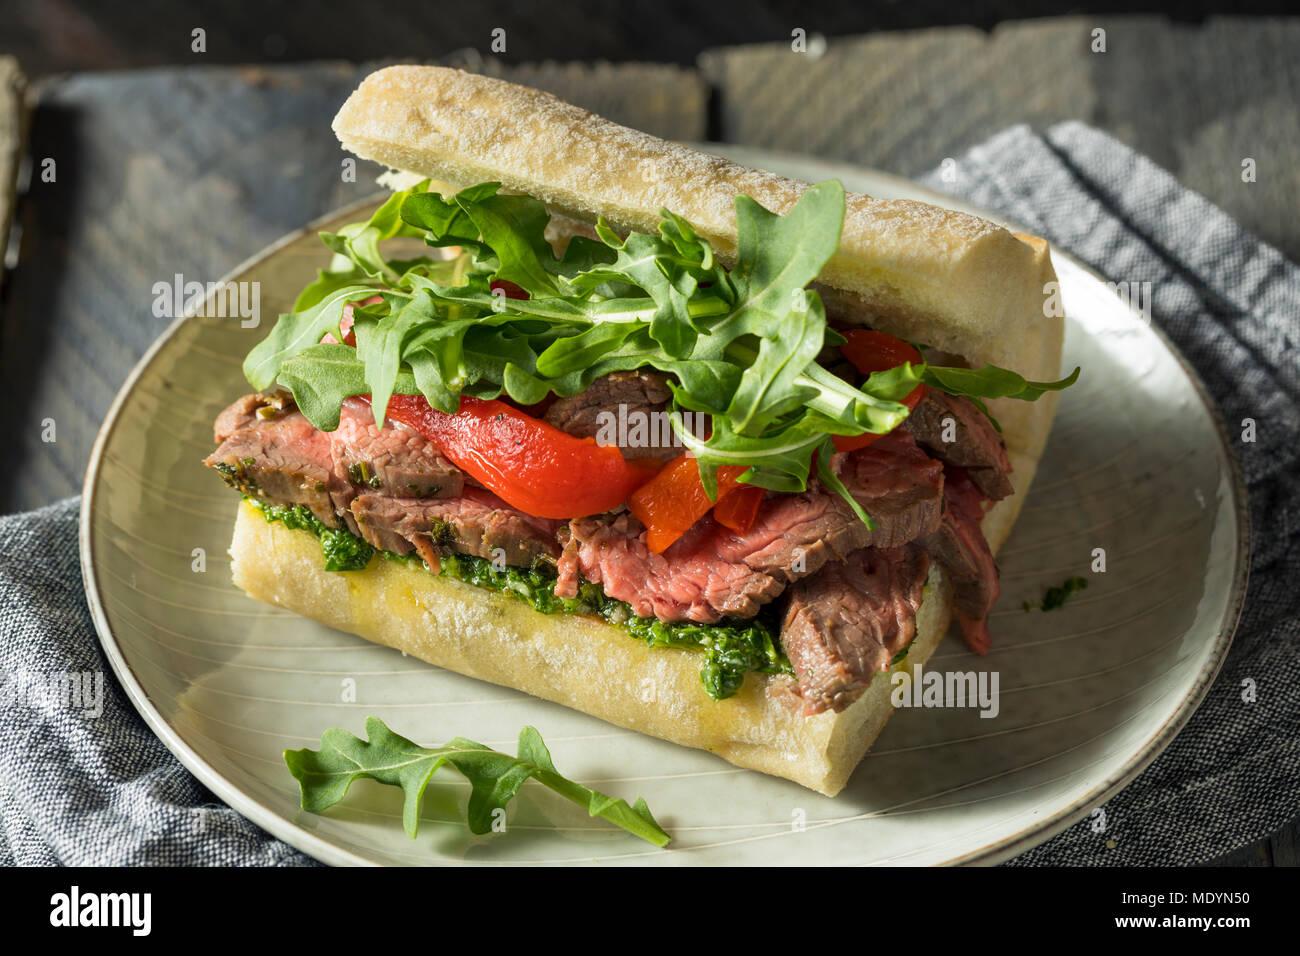 Homemade Beef Steak Sandwich with Chimichurri and Arugula Stock Photo